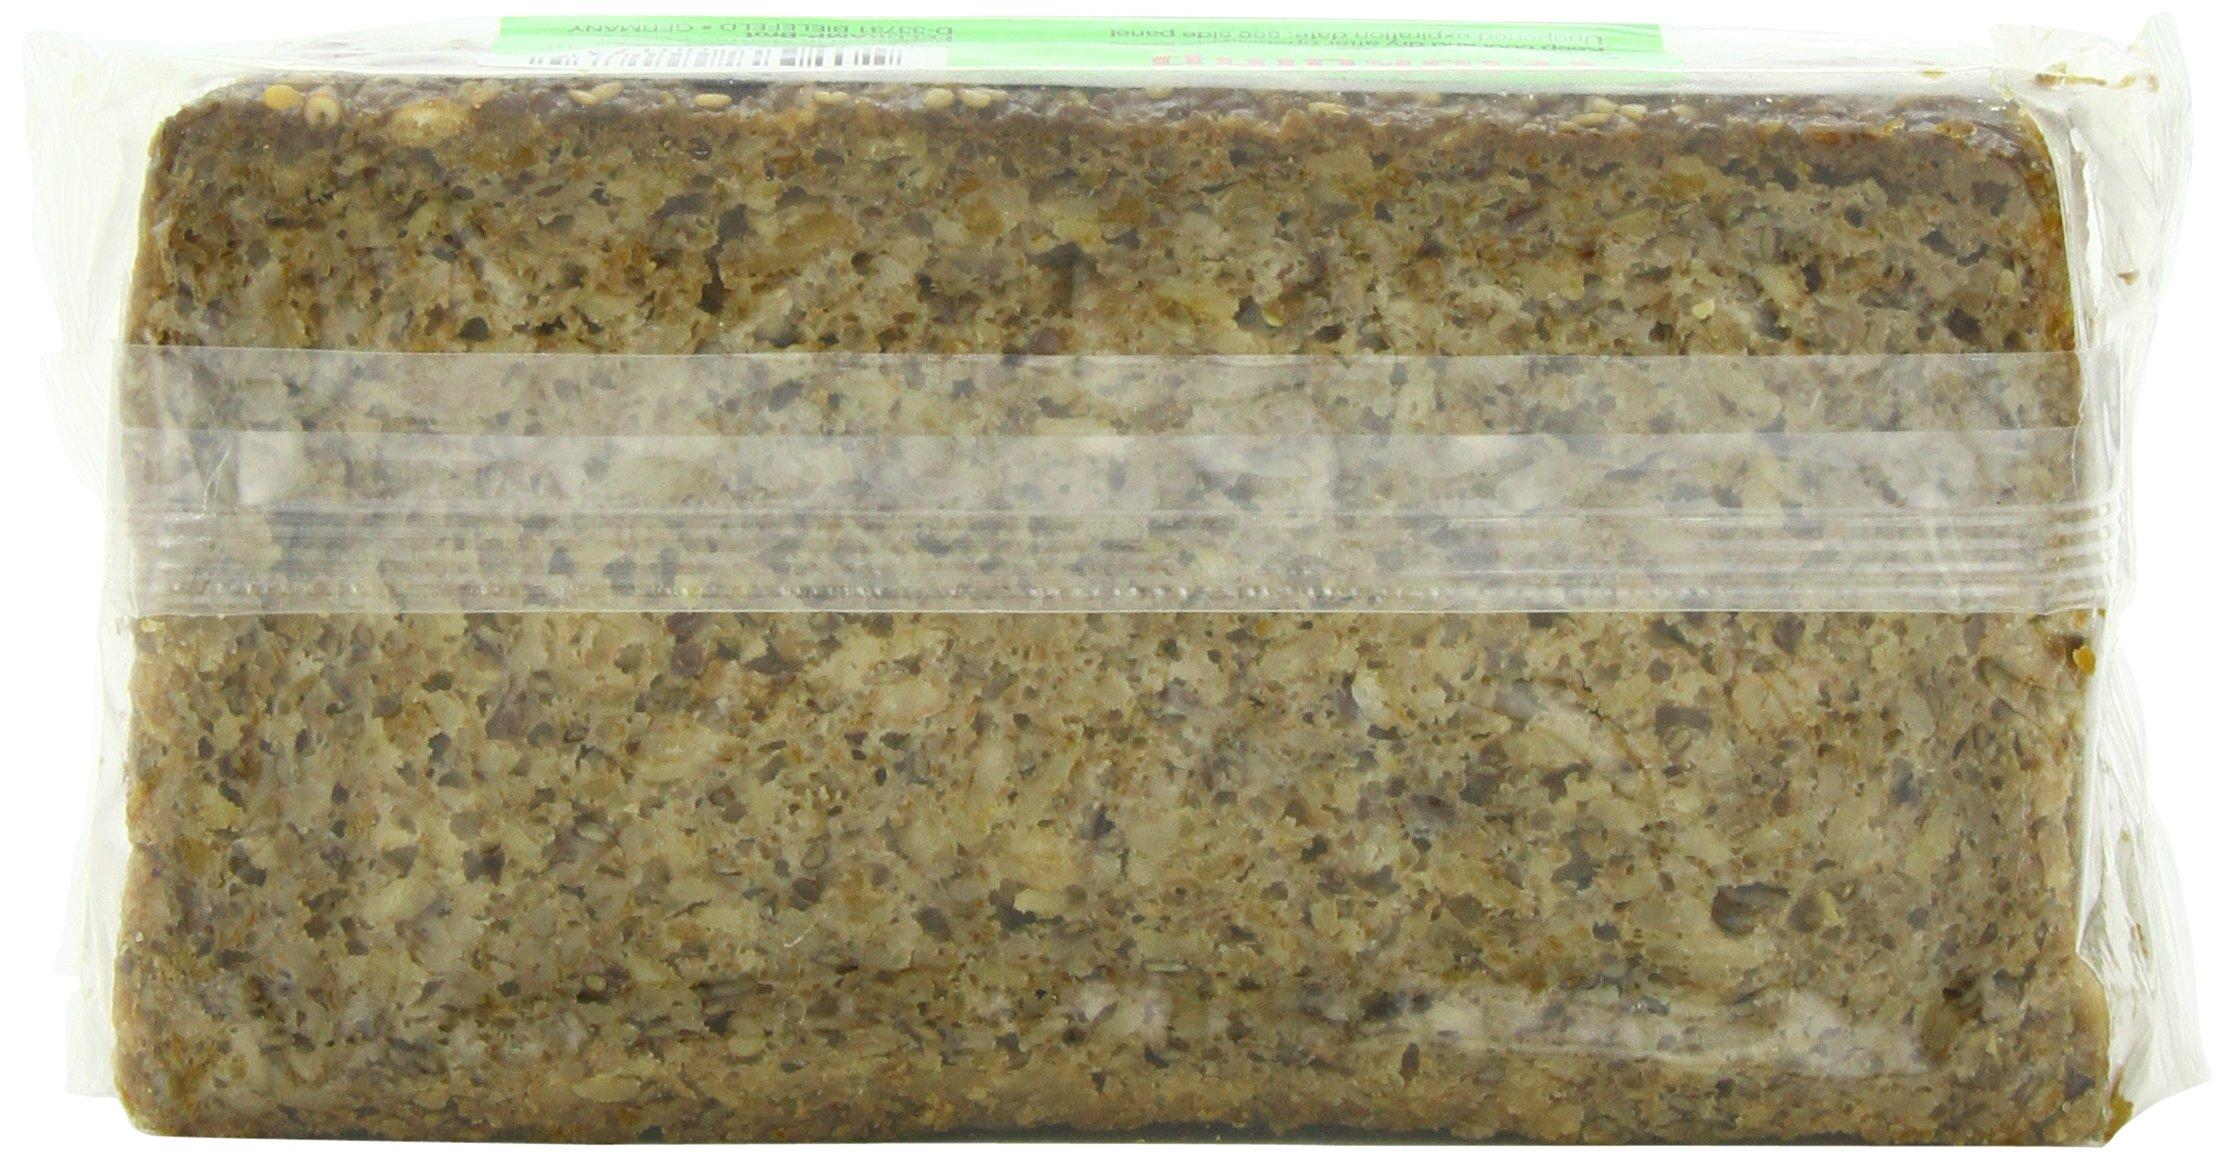 Delba Famous German Three Grain Bread, 16.75 Ounce (Pack of 12)